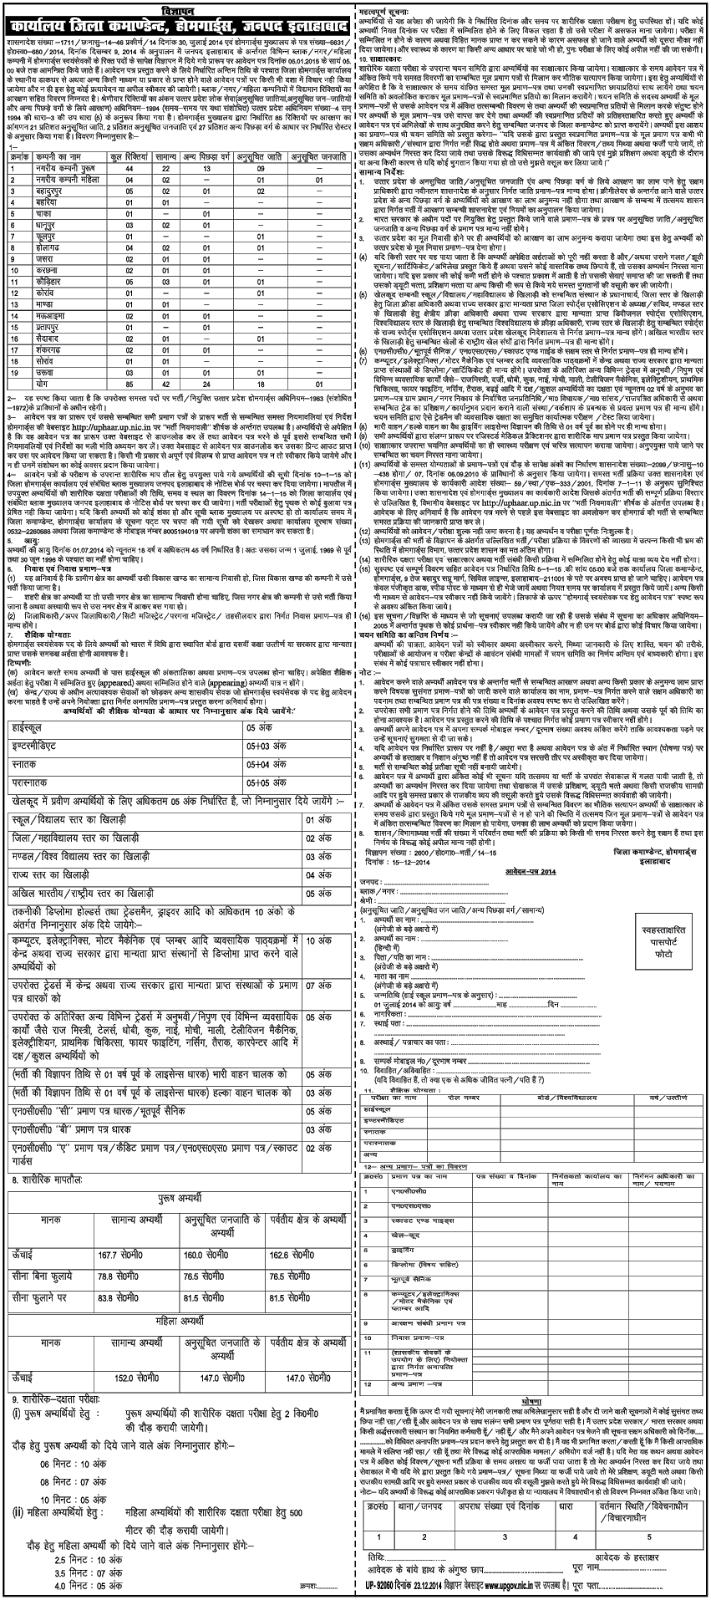 19000 Up Home Guard Recruitment Notification 2020 News